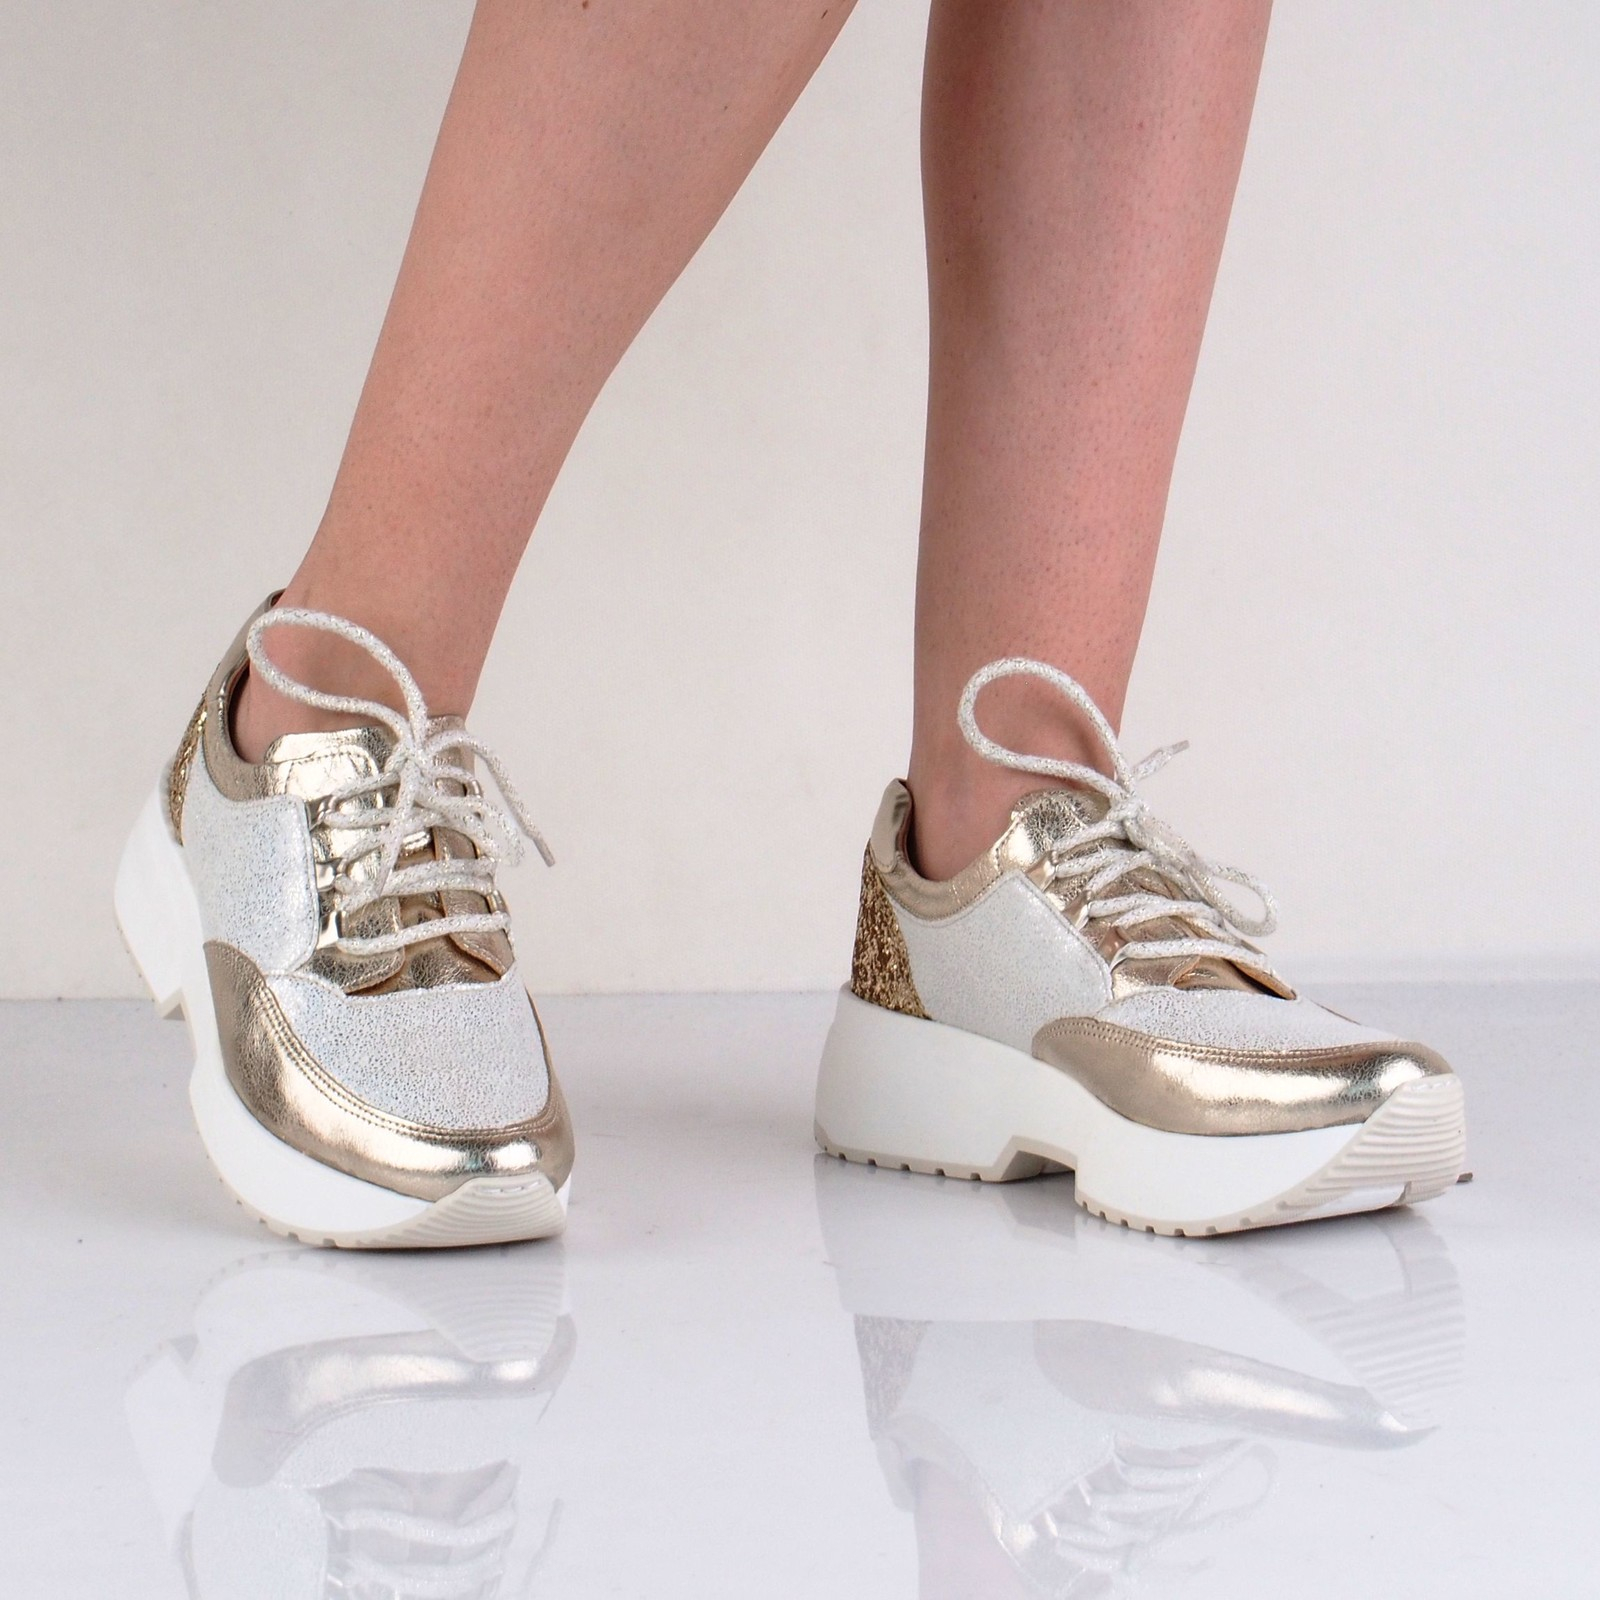 Olivia shoes dámske štýlové tenisky - bielozlaté